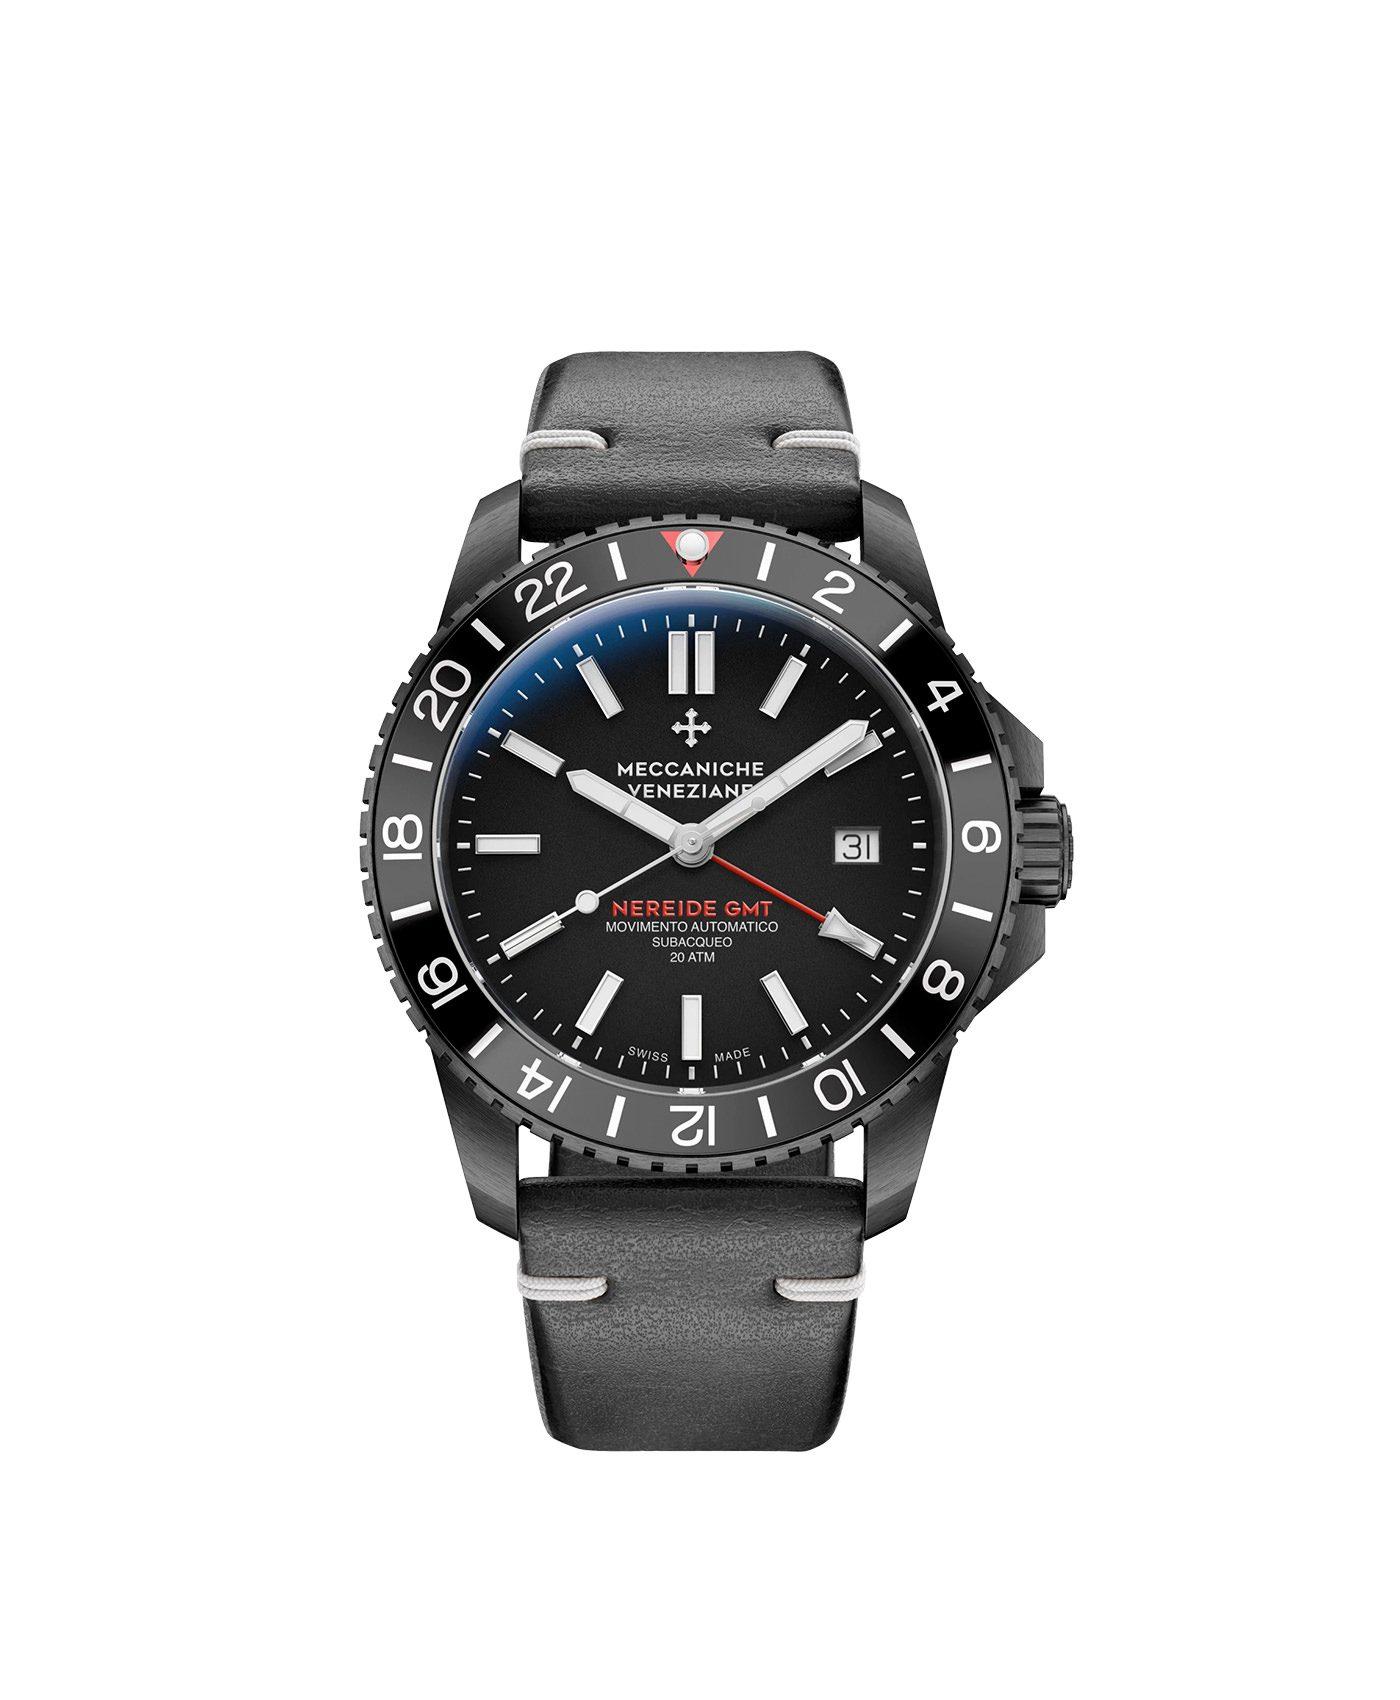 WatchBandit Meccaniche Veneziane GMT nereide gmt ardesia pvd front